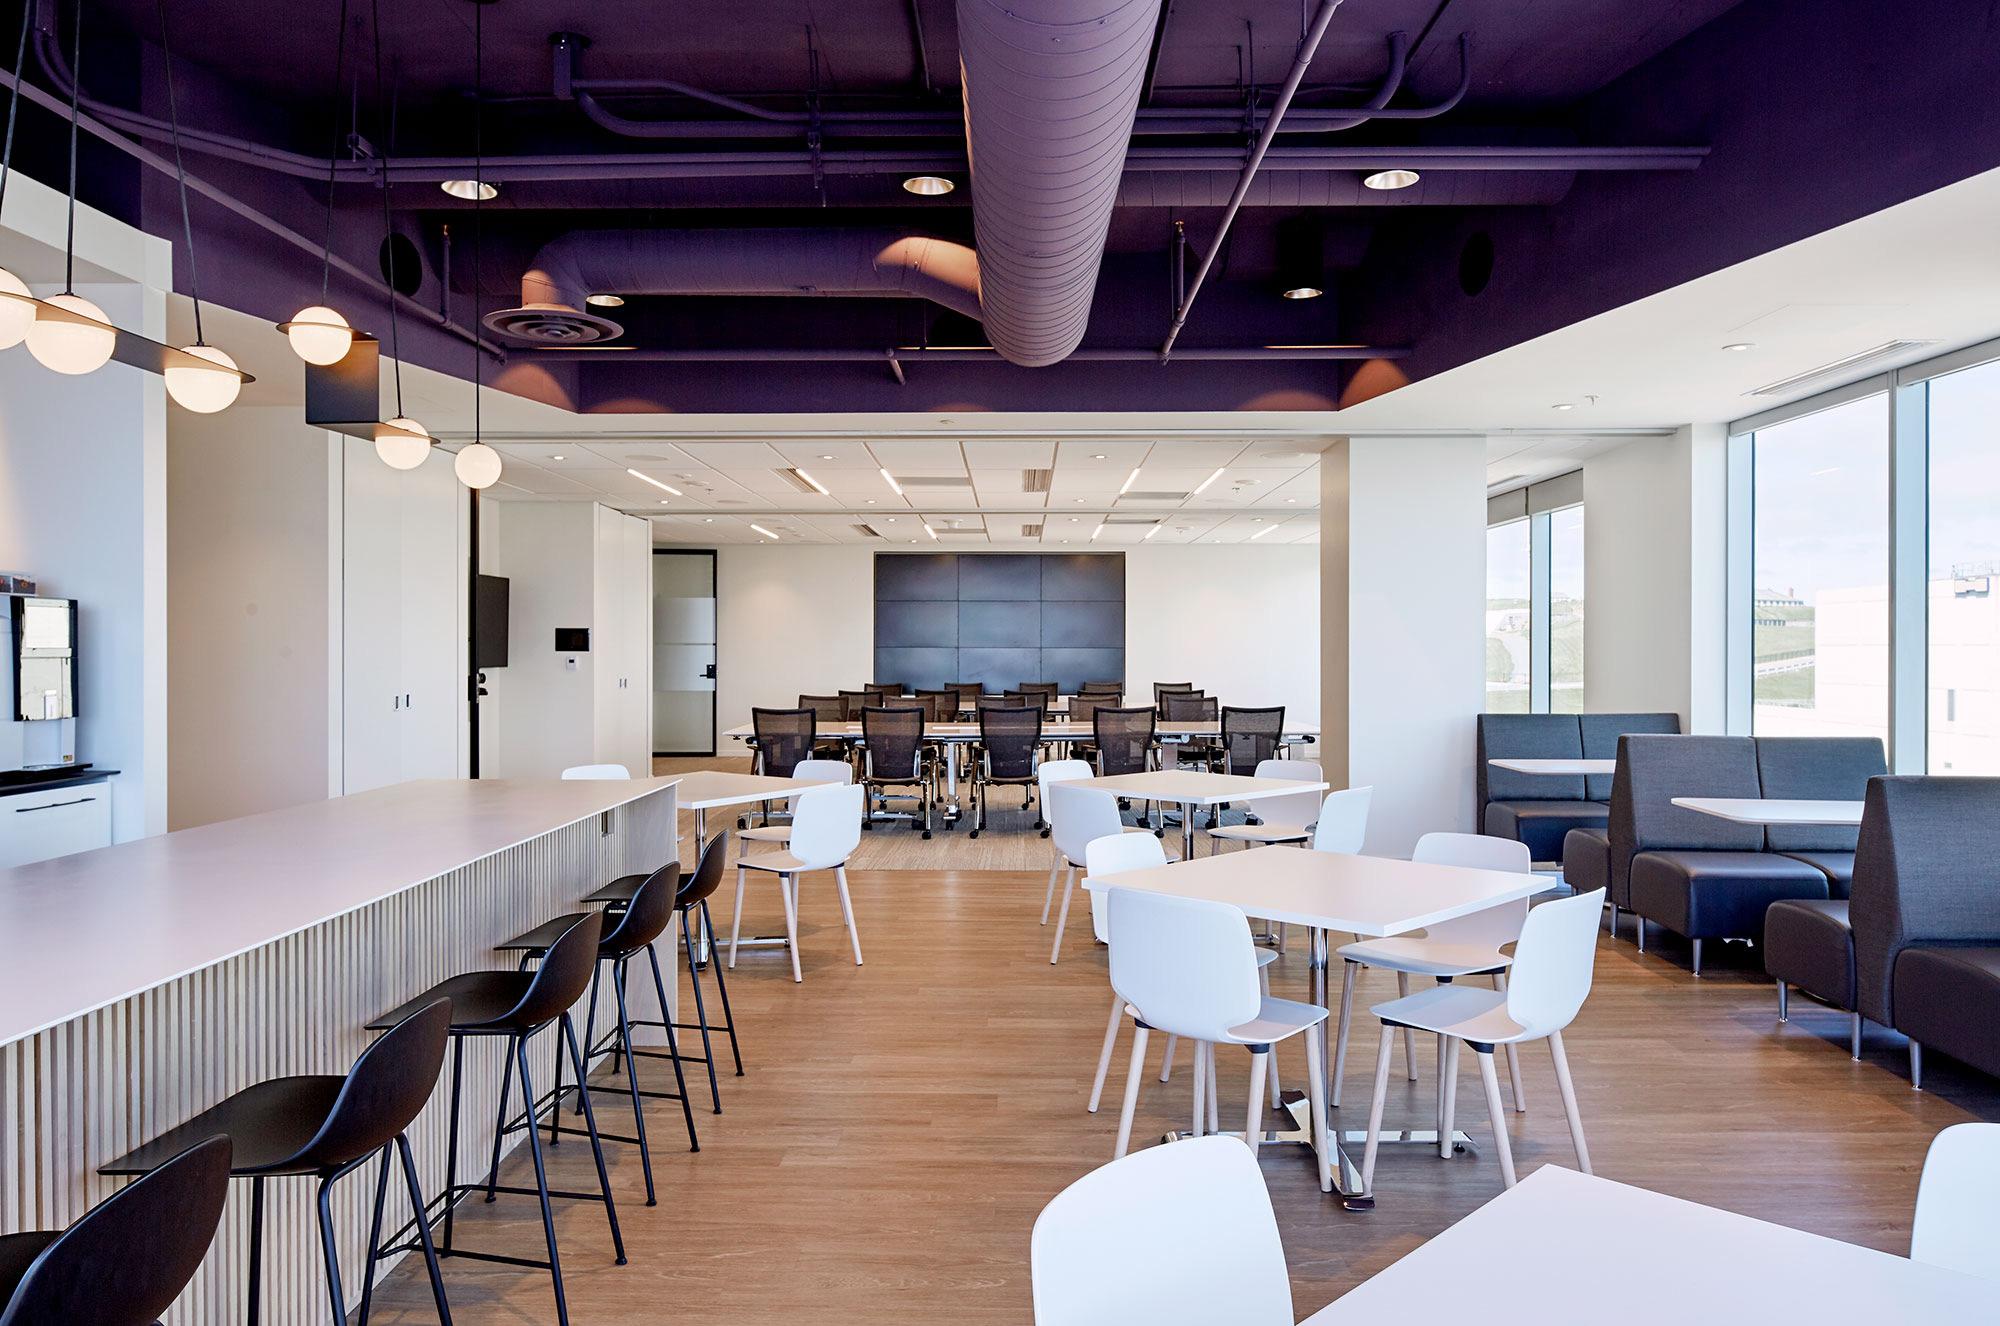 halifax-interior-design-law-office-cafe.jpg